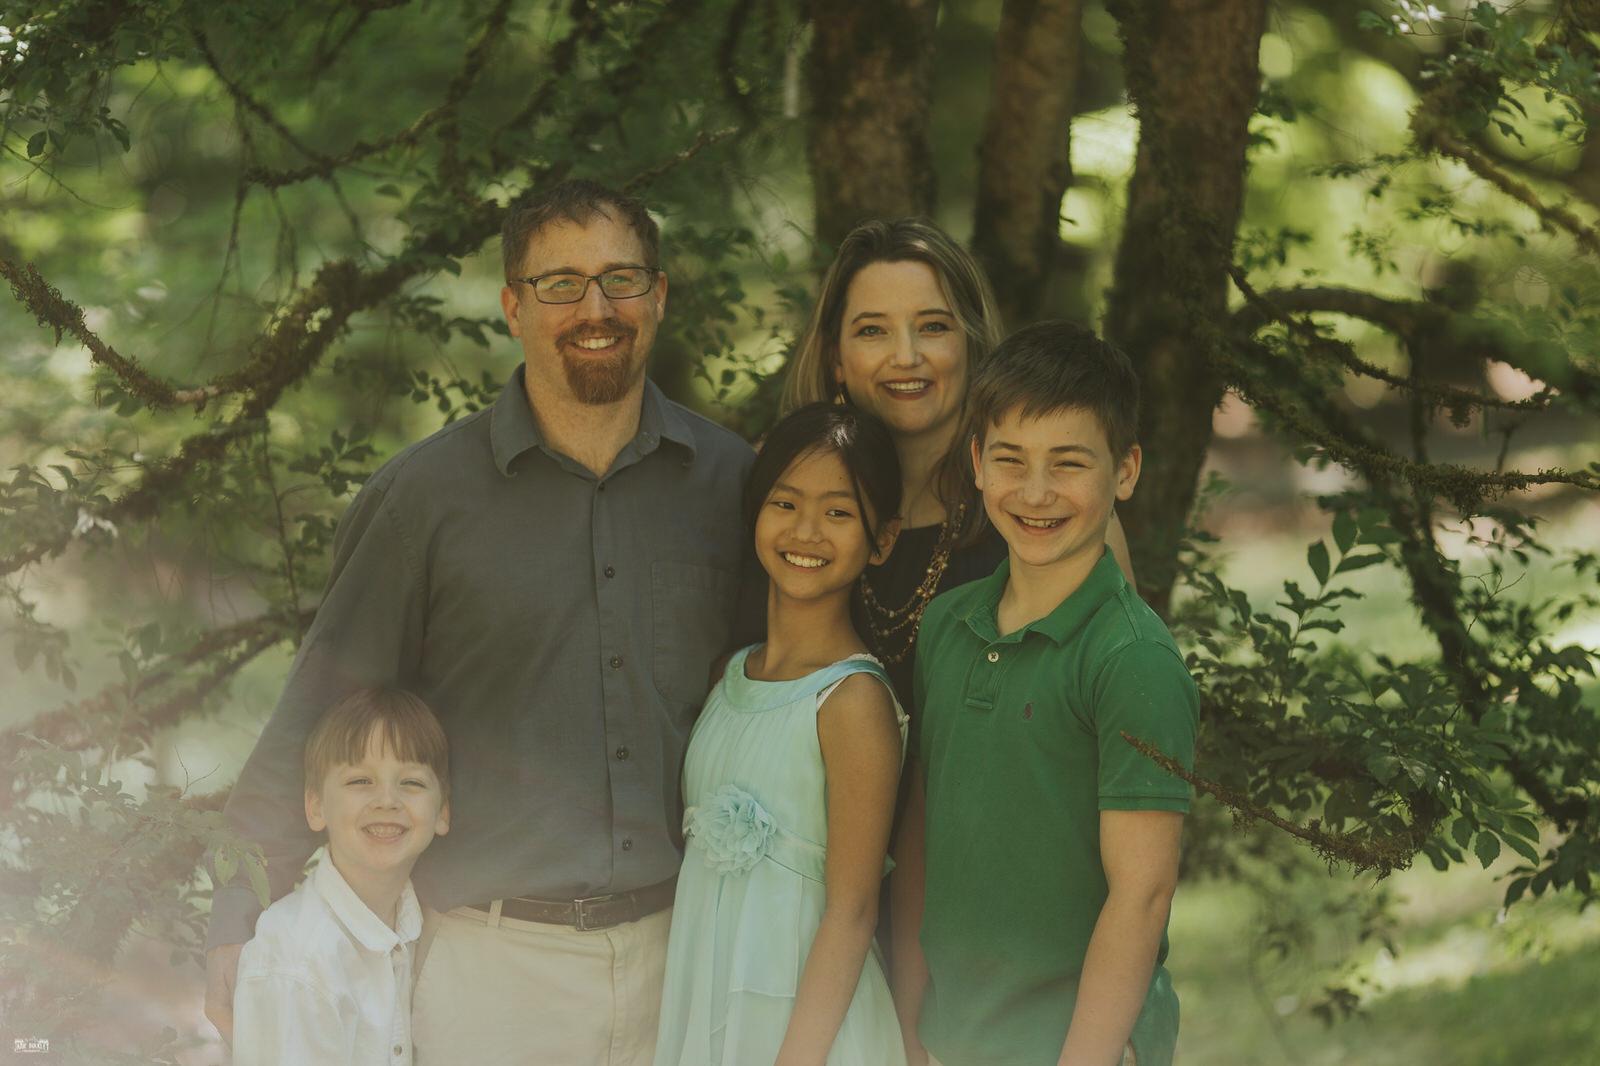 family-photos-at-the-washington-arboretum-seattle-family-photography